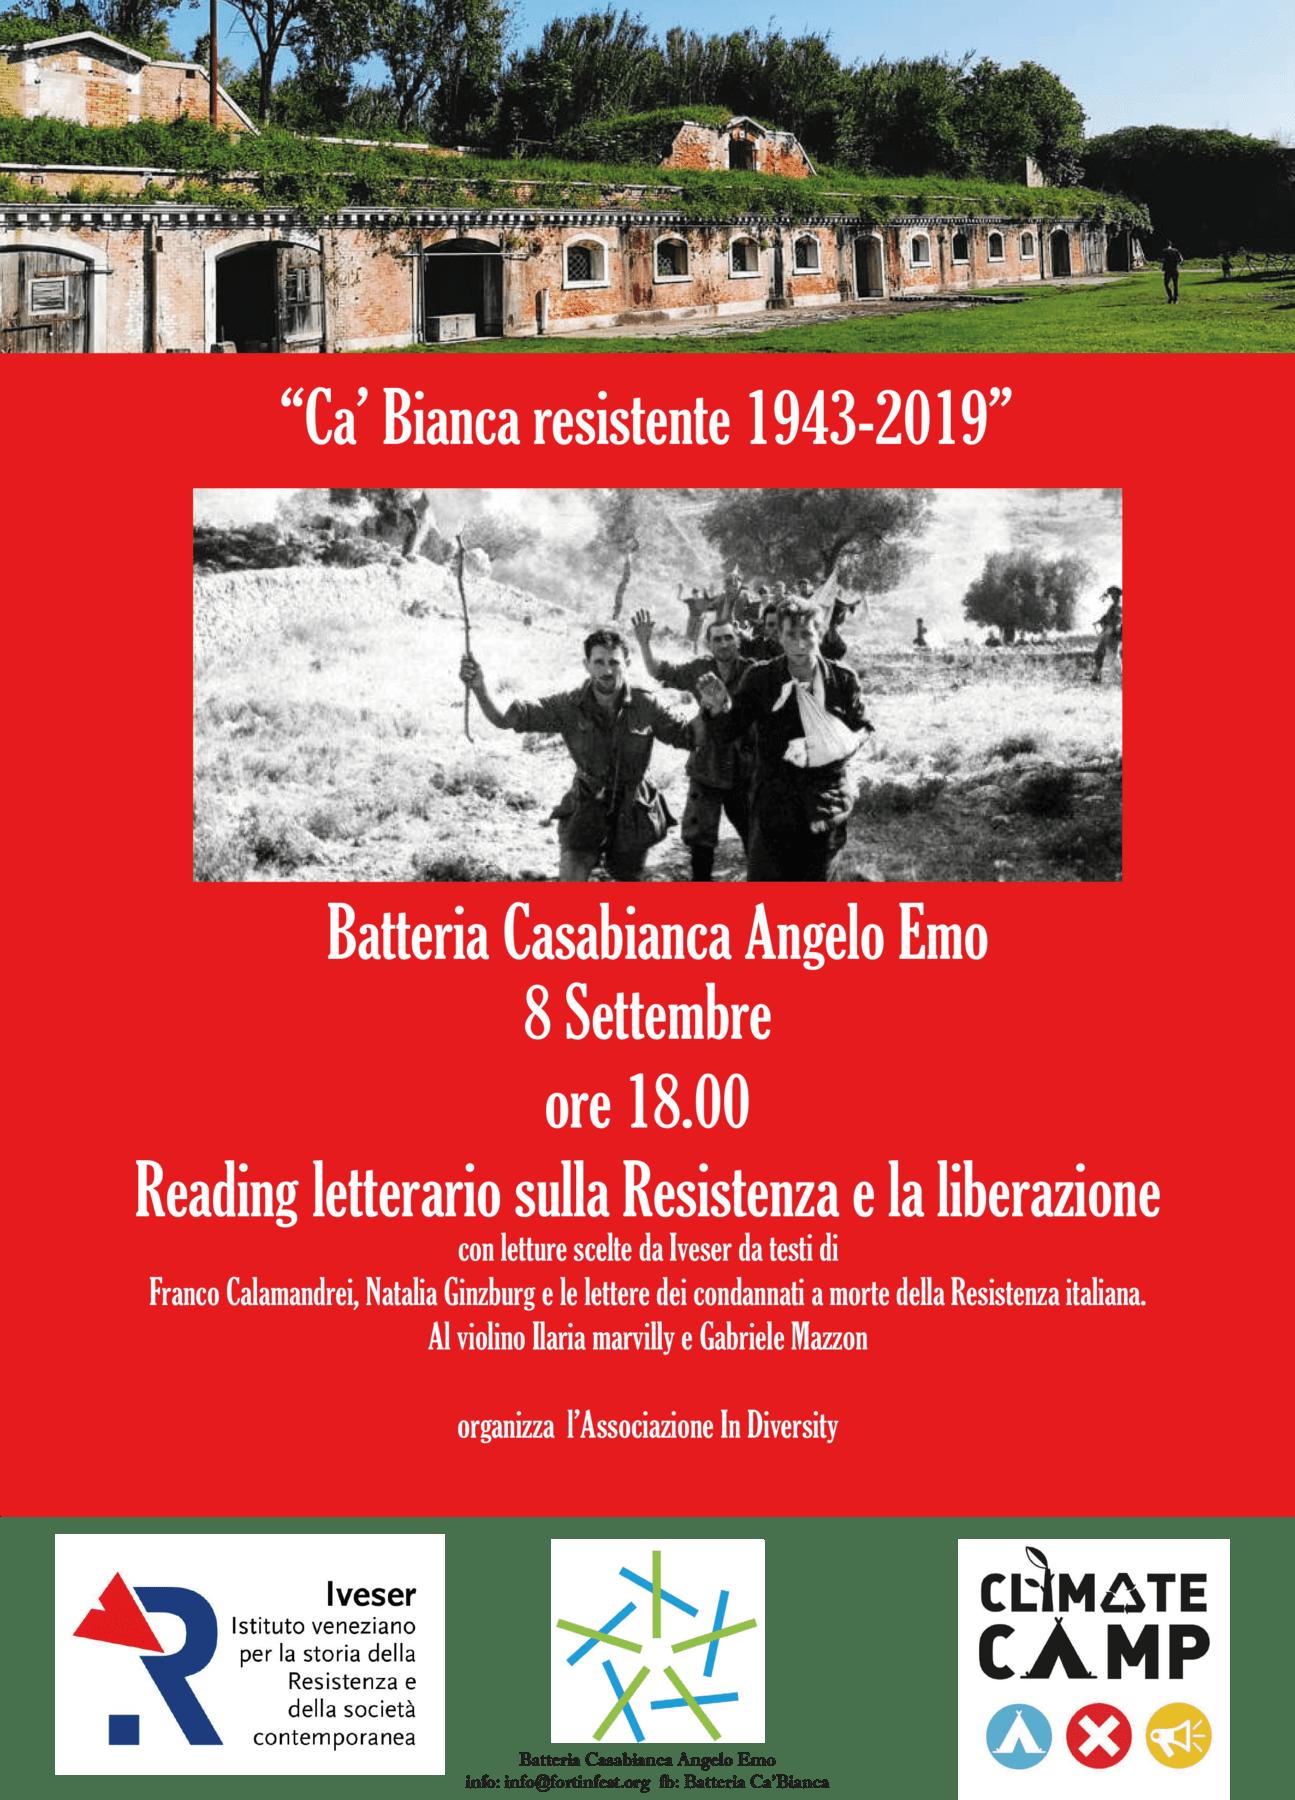 CA'BIANCA RESISTENTE 1943/2019